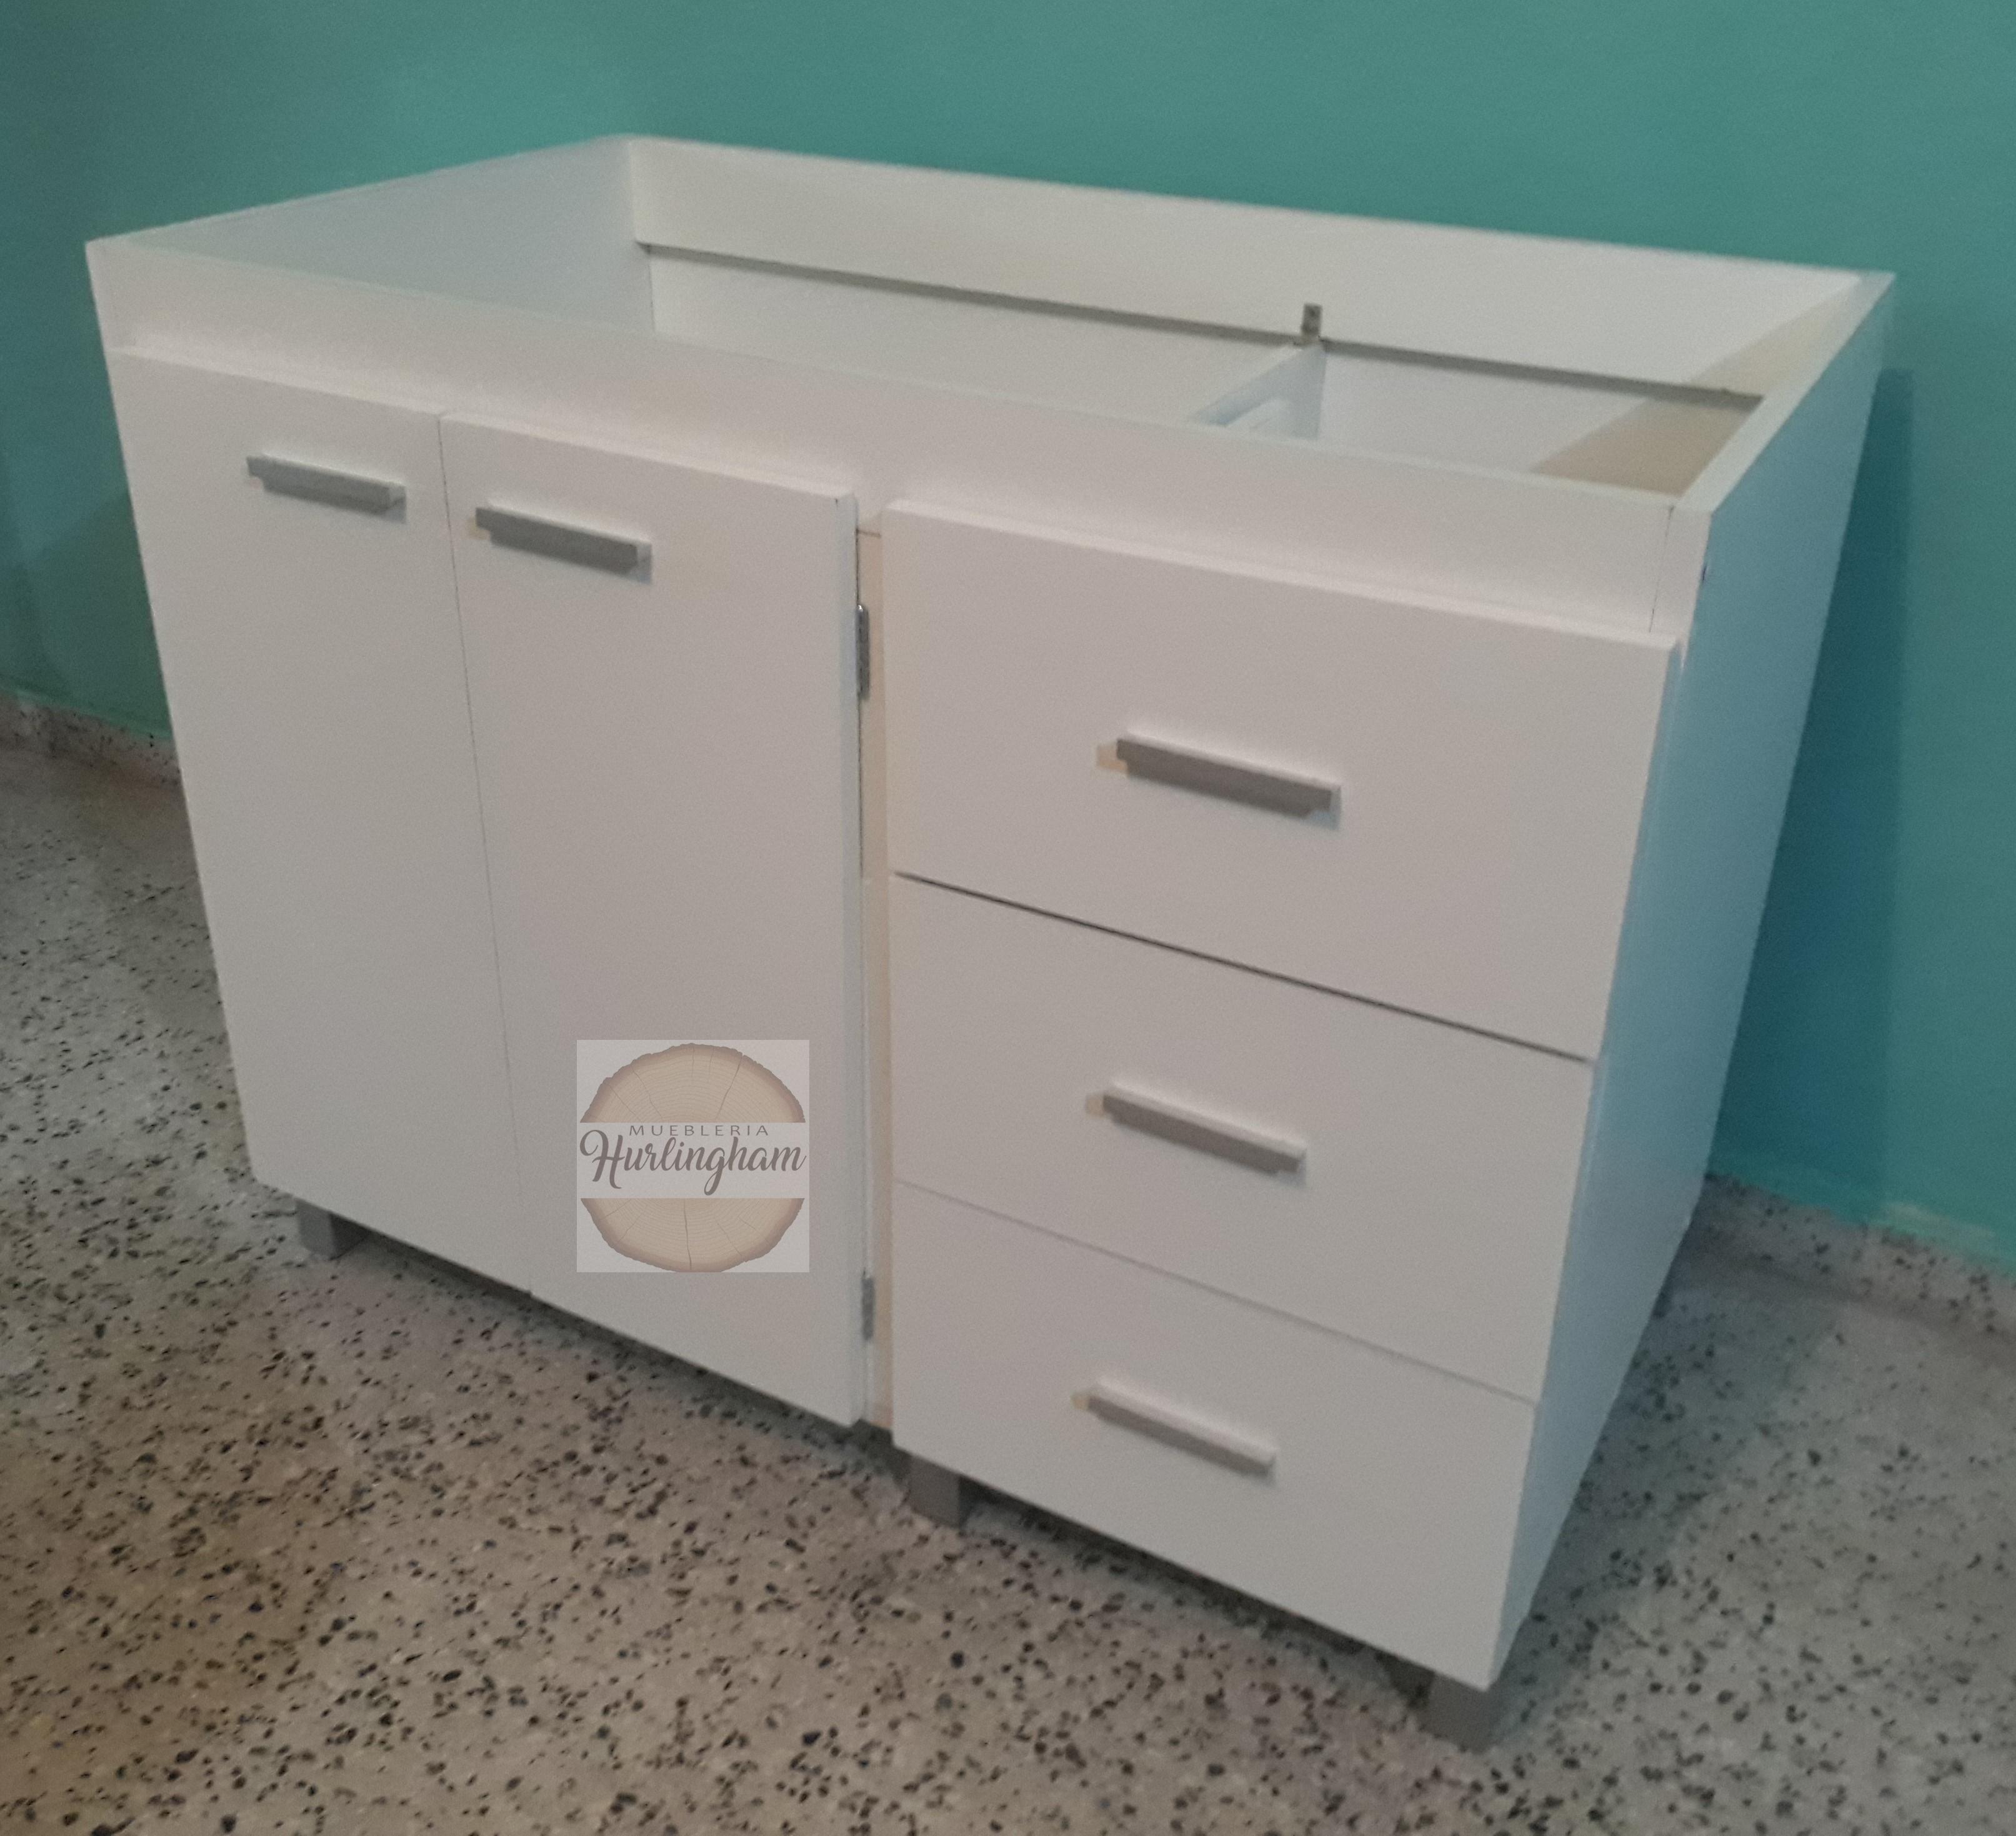 Mueble de cocina, bajo mesada, melamina blanca 18 mm 1,20 x 87 x 55 ...